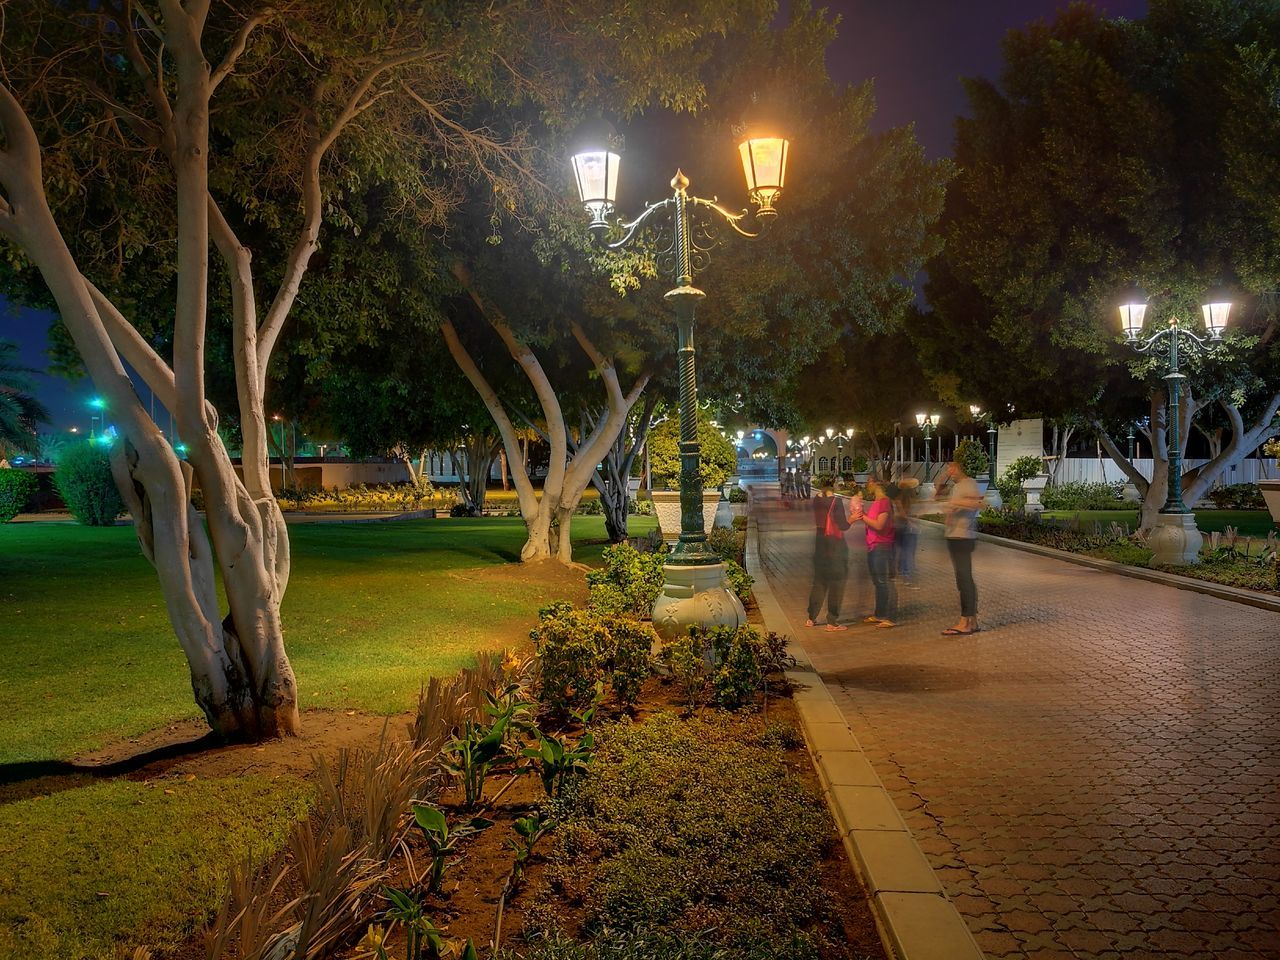 illuminated, lighting equipment, tree, night, street light, growth, flower, outdoors, tree trunk, nature, walkway, real people, beauty in nature, grass, city